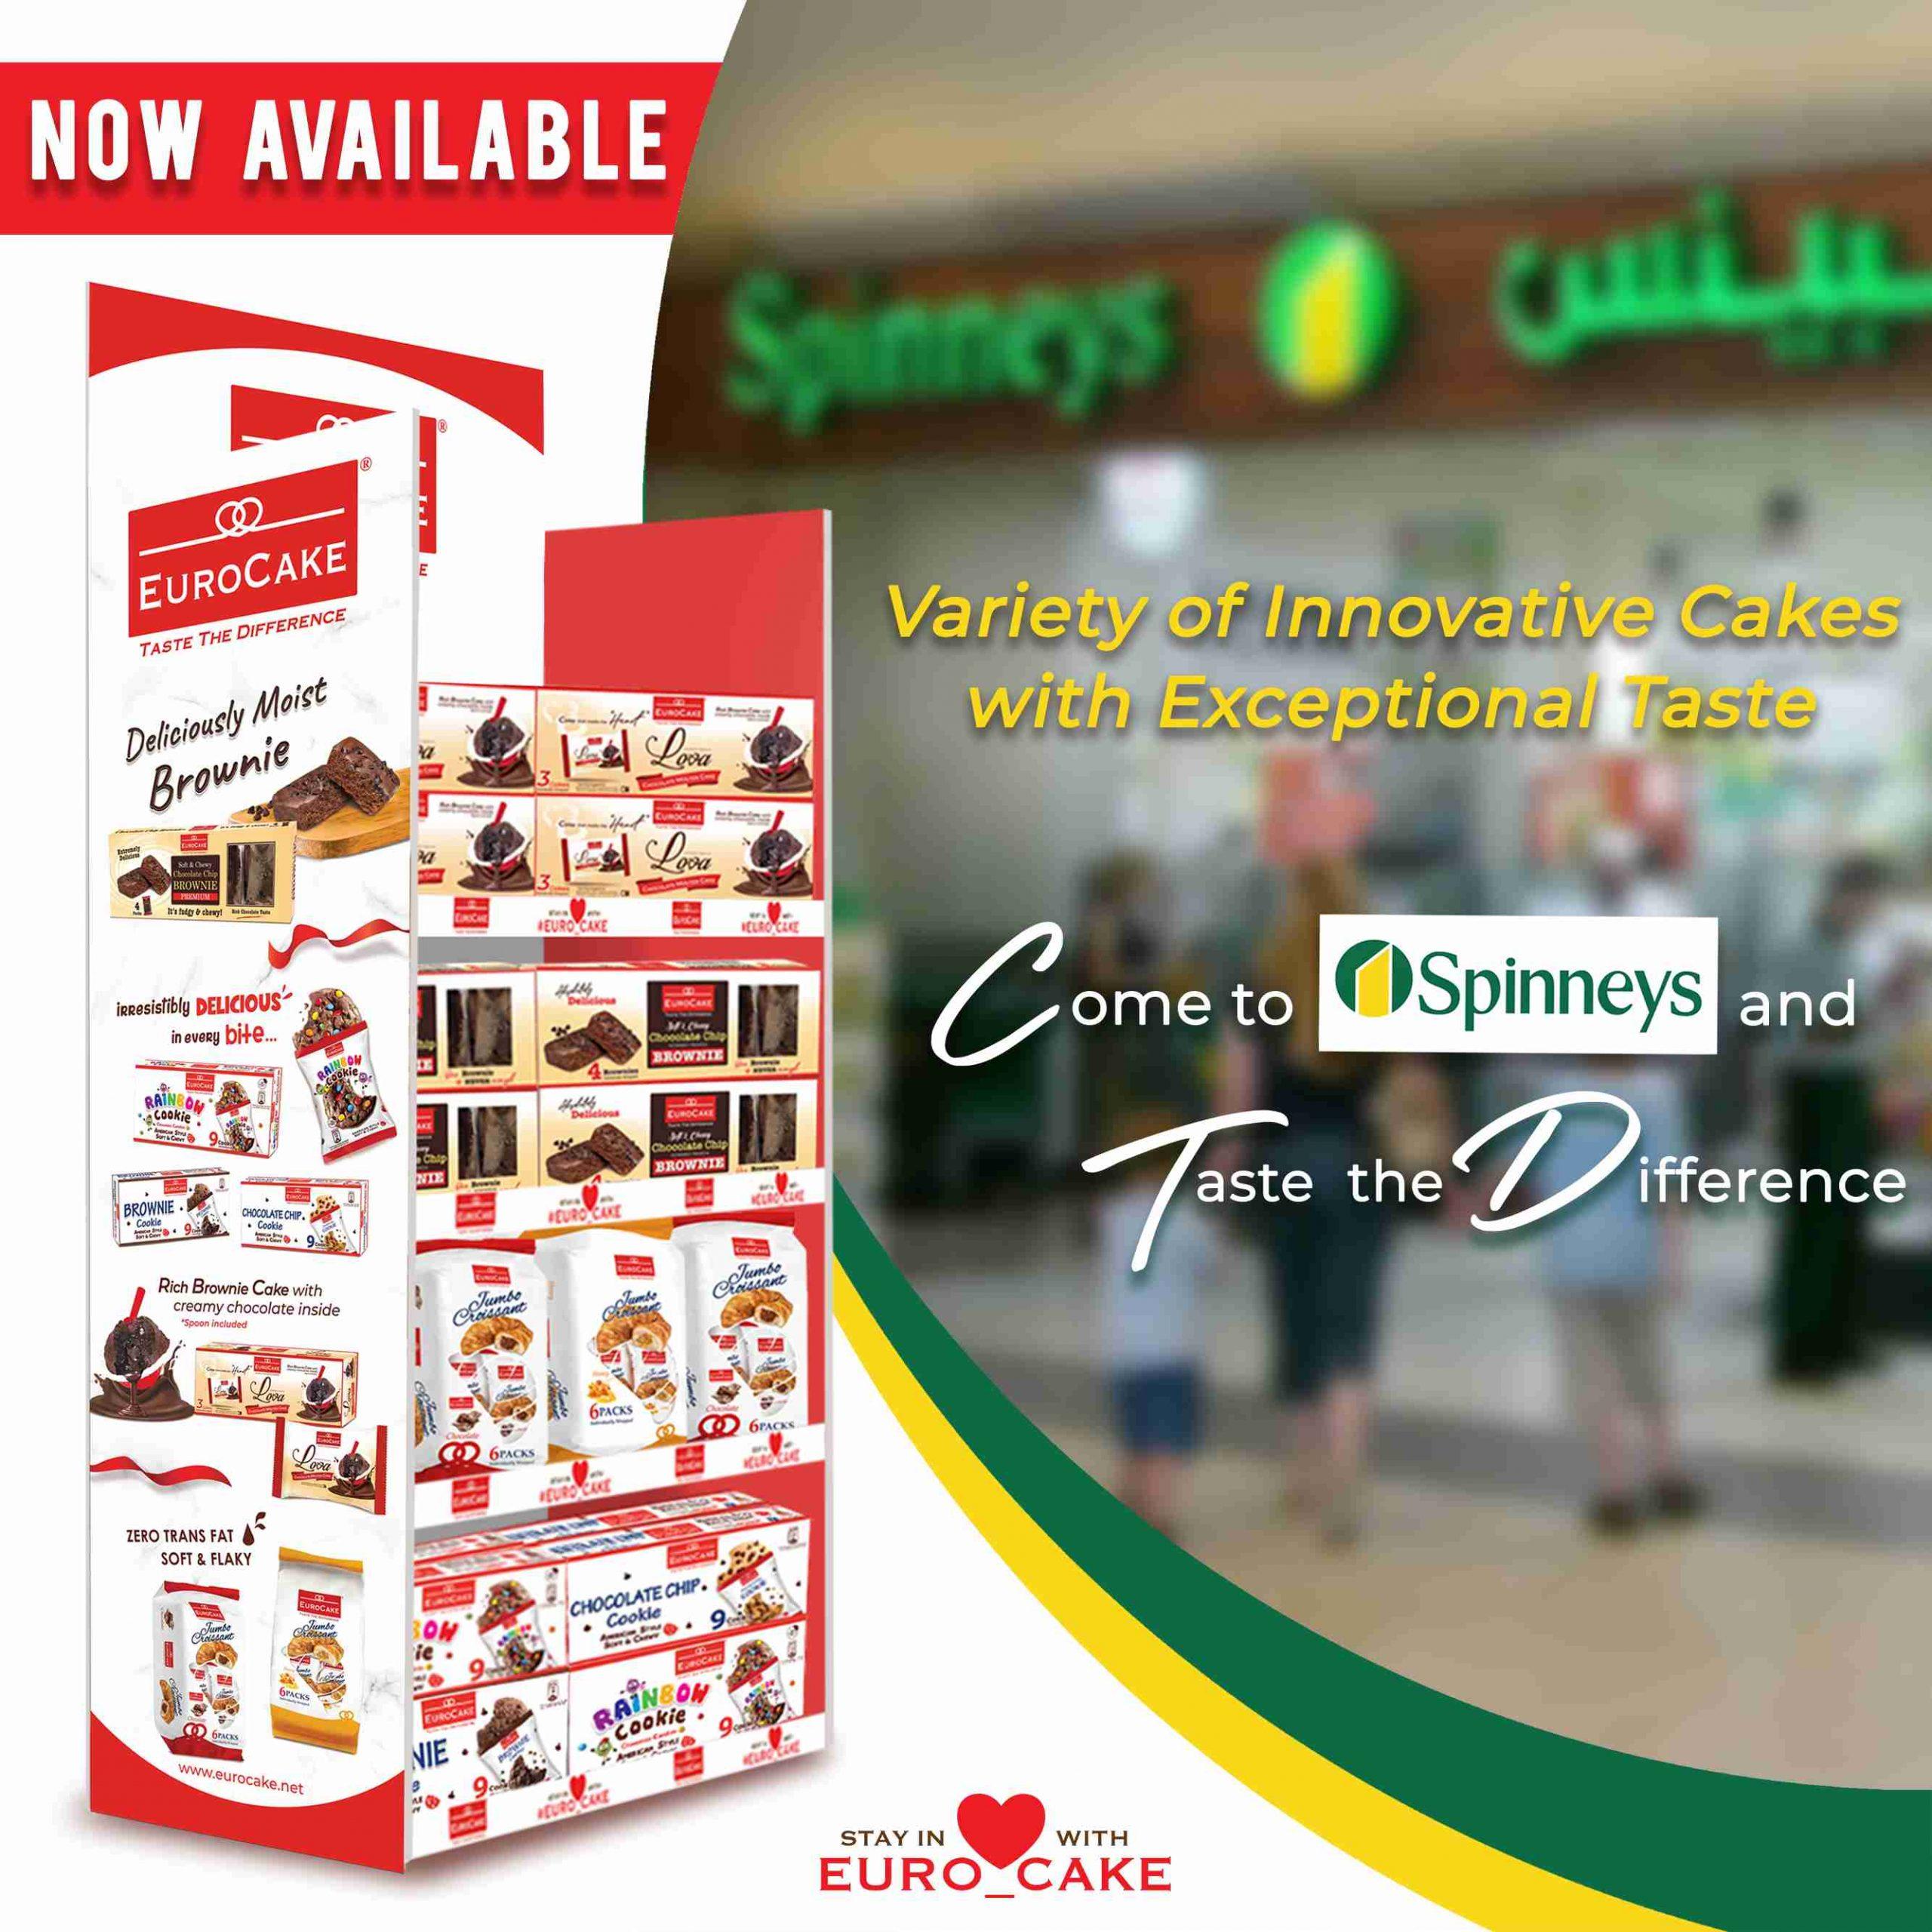 Eurocake Product Range at Spinneys Supermarket Chain Throughout the UAE